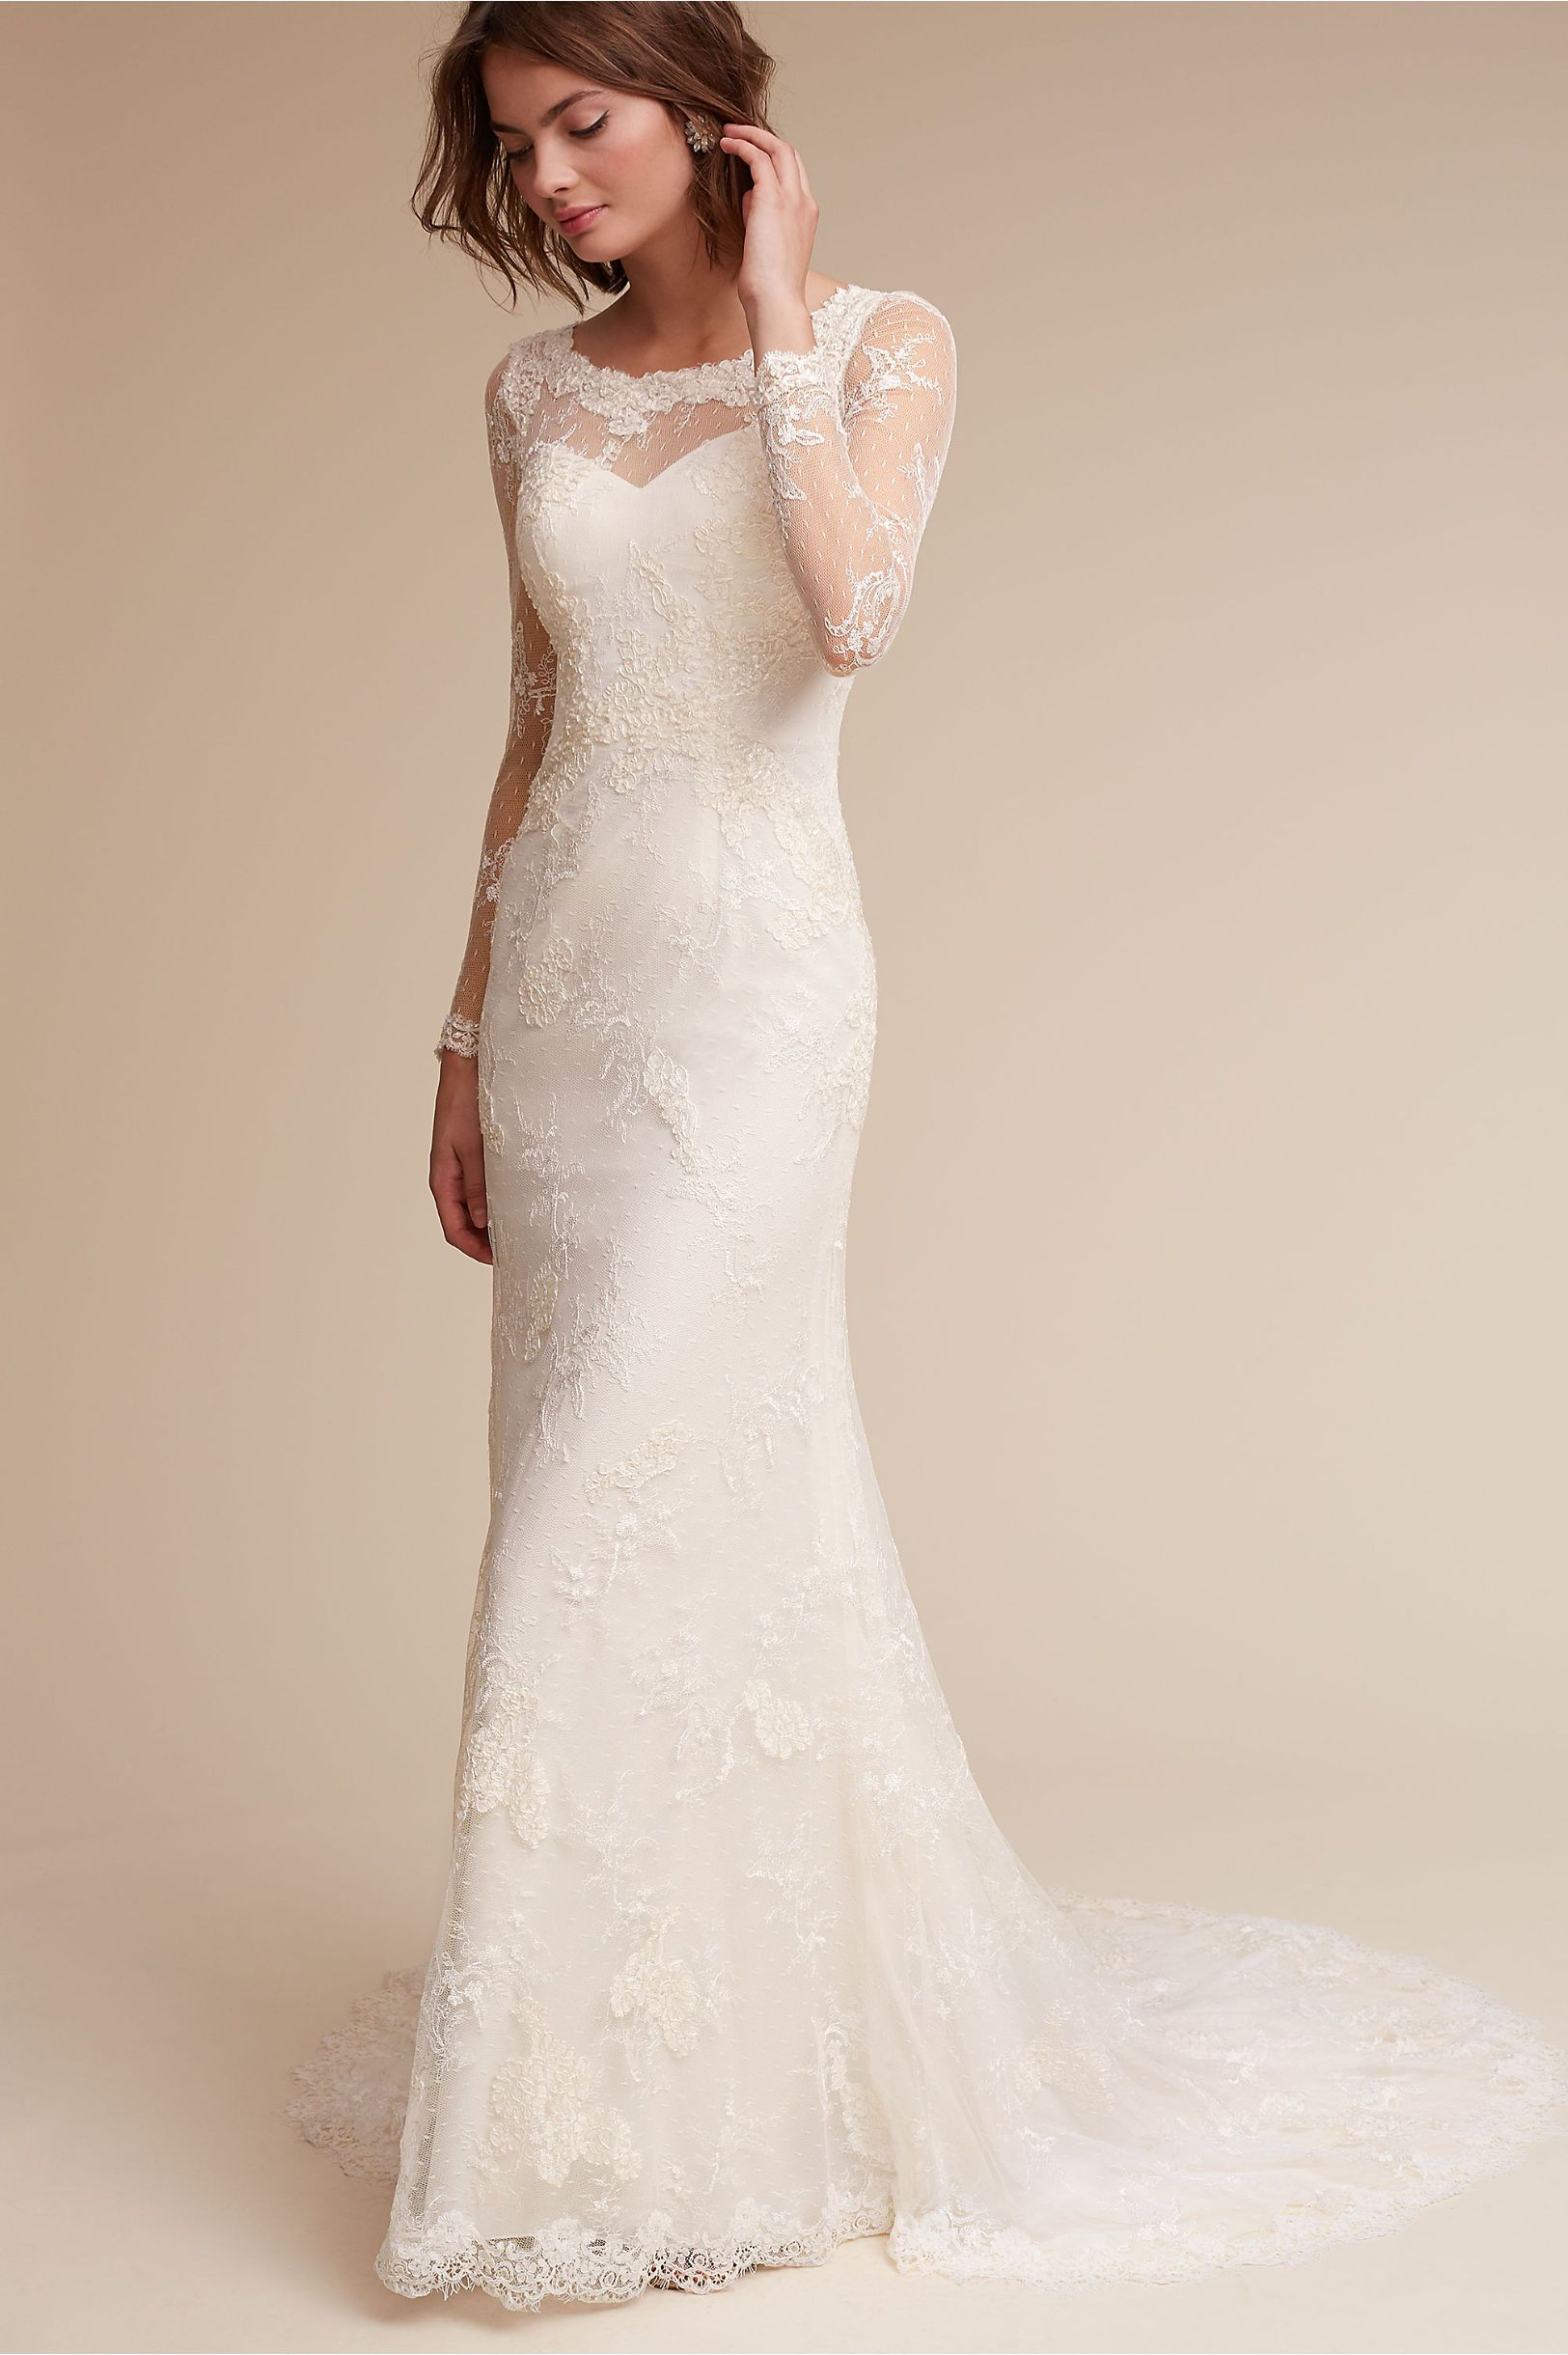 Anja Wedding Dress In 2020 Wedding Dresses Lace Weddings